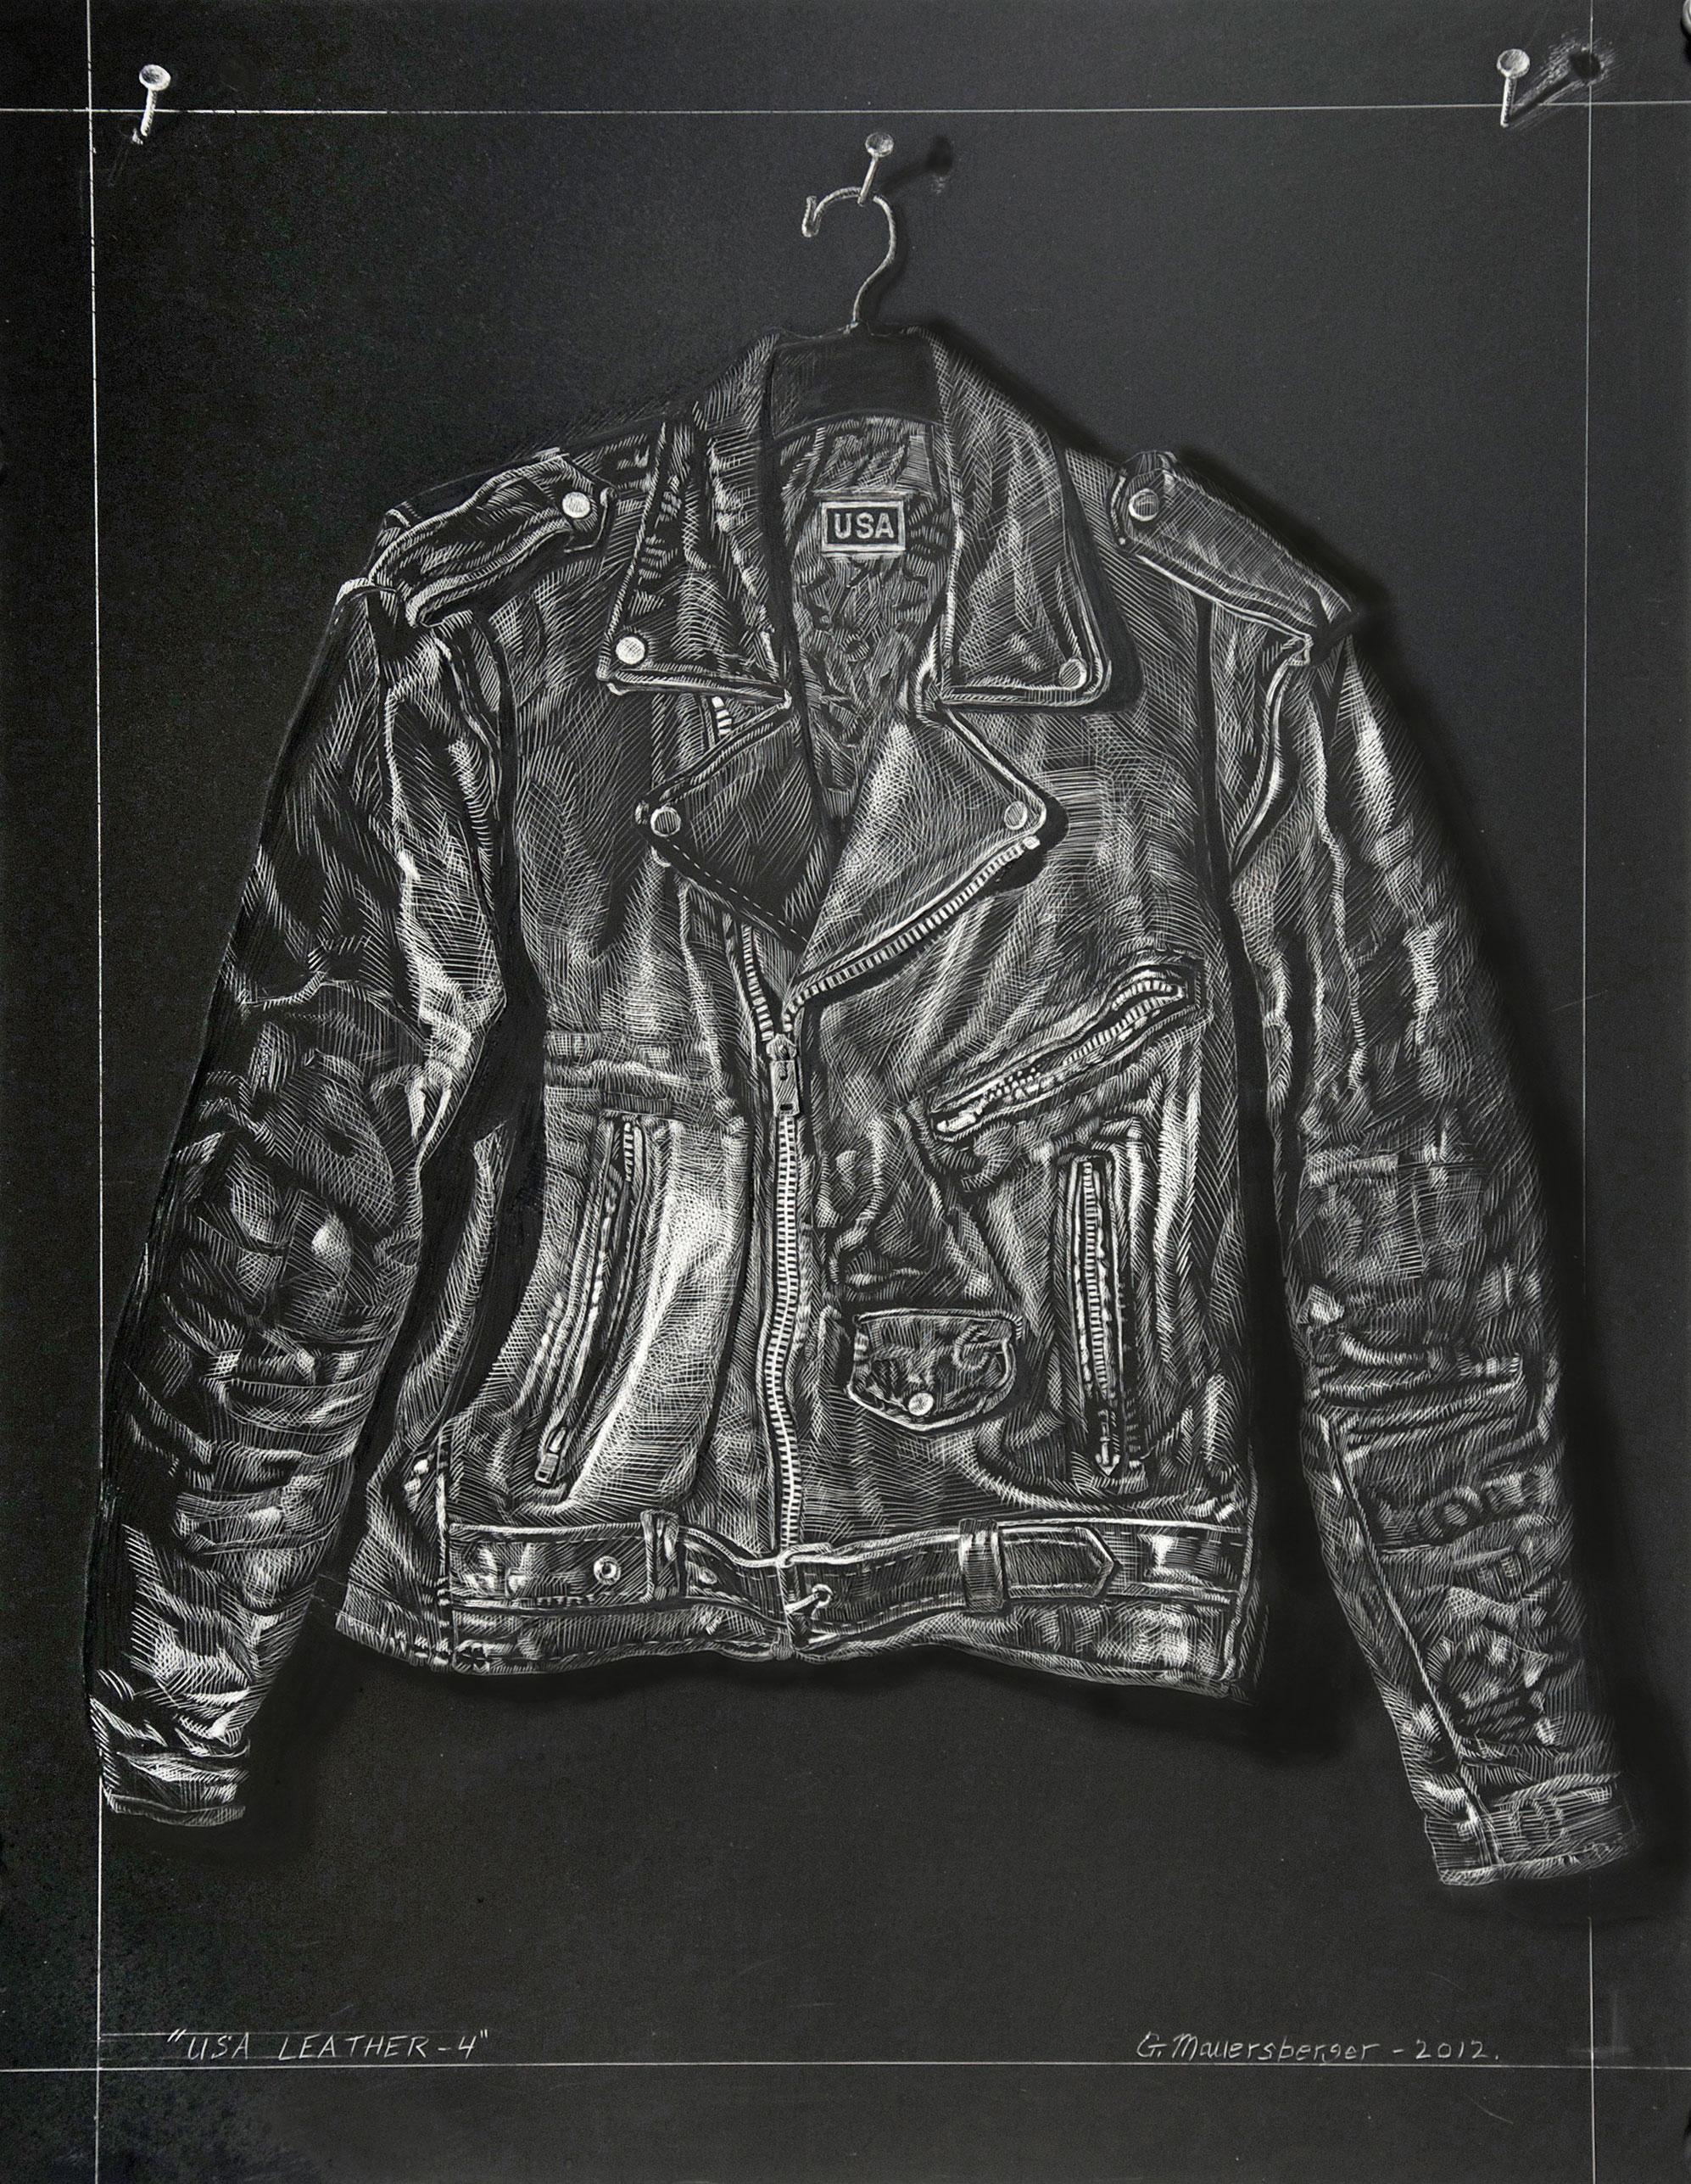 USA Leather 4